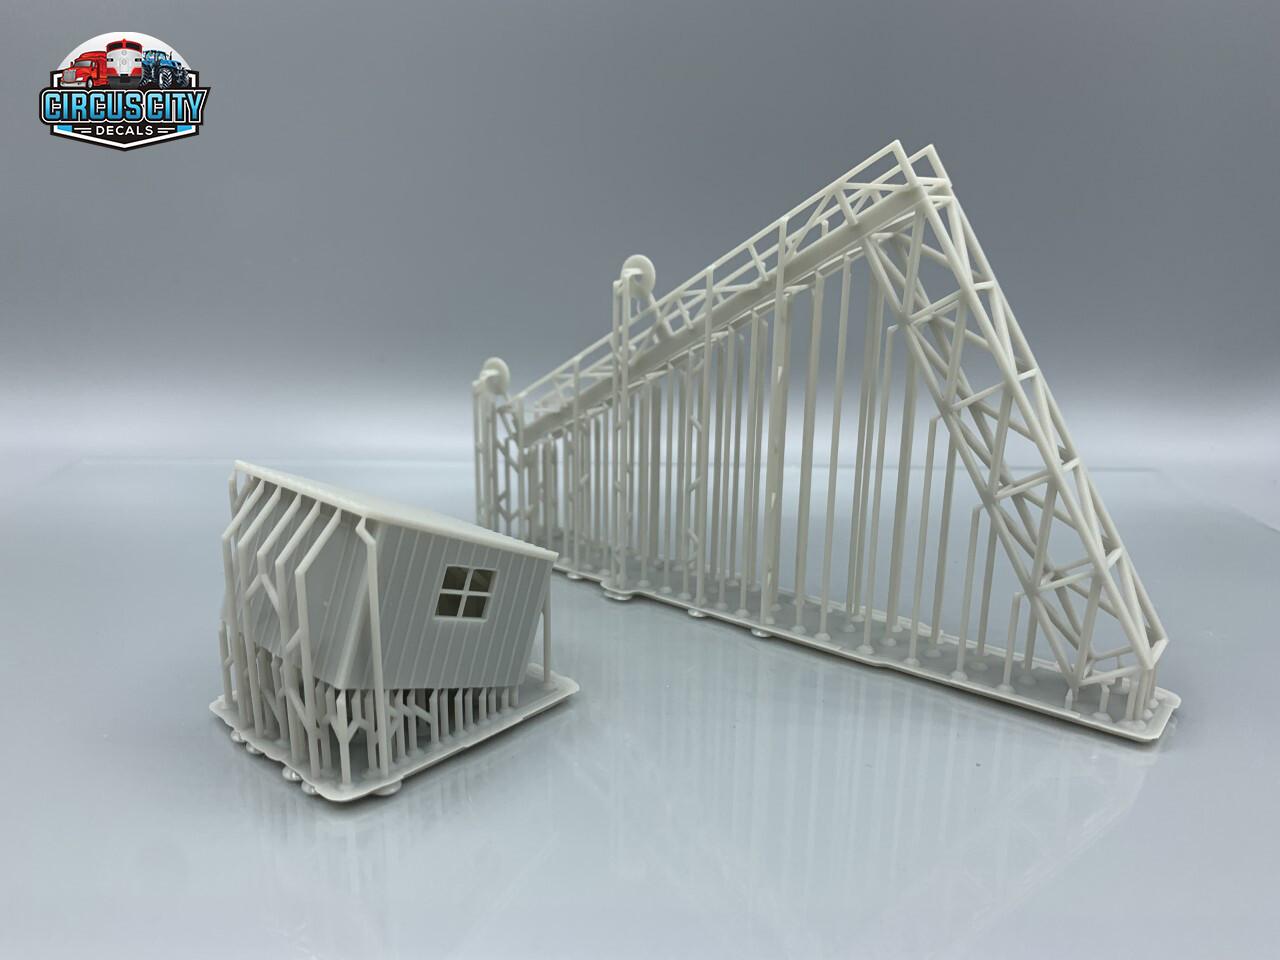 LS&I Style Signal Bridge Double Track HO Scale